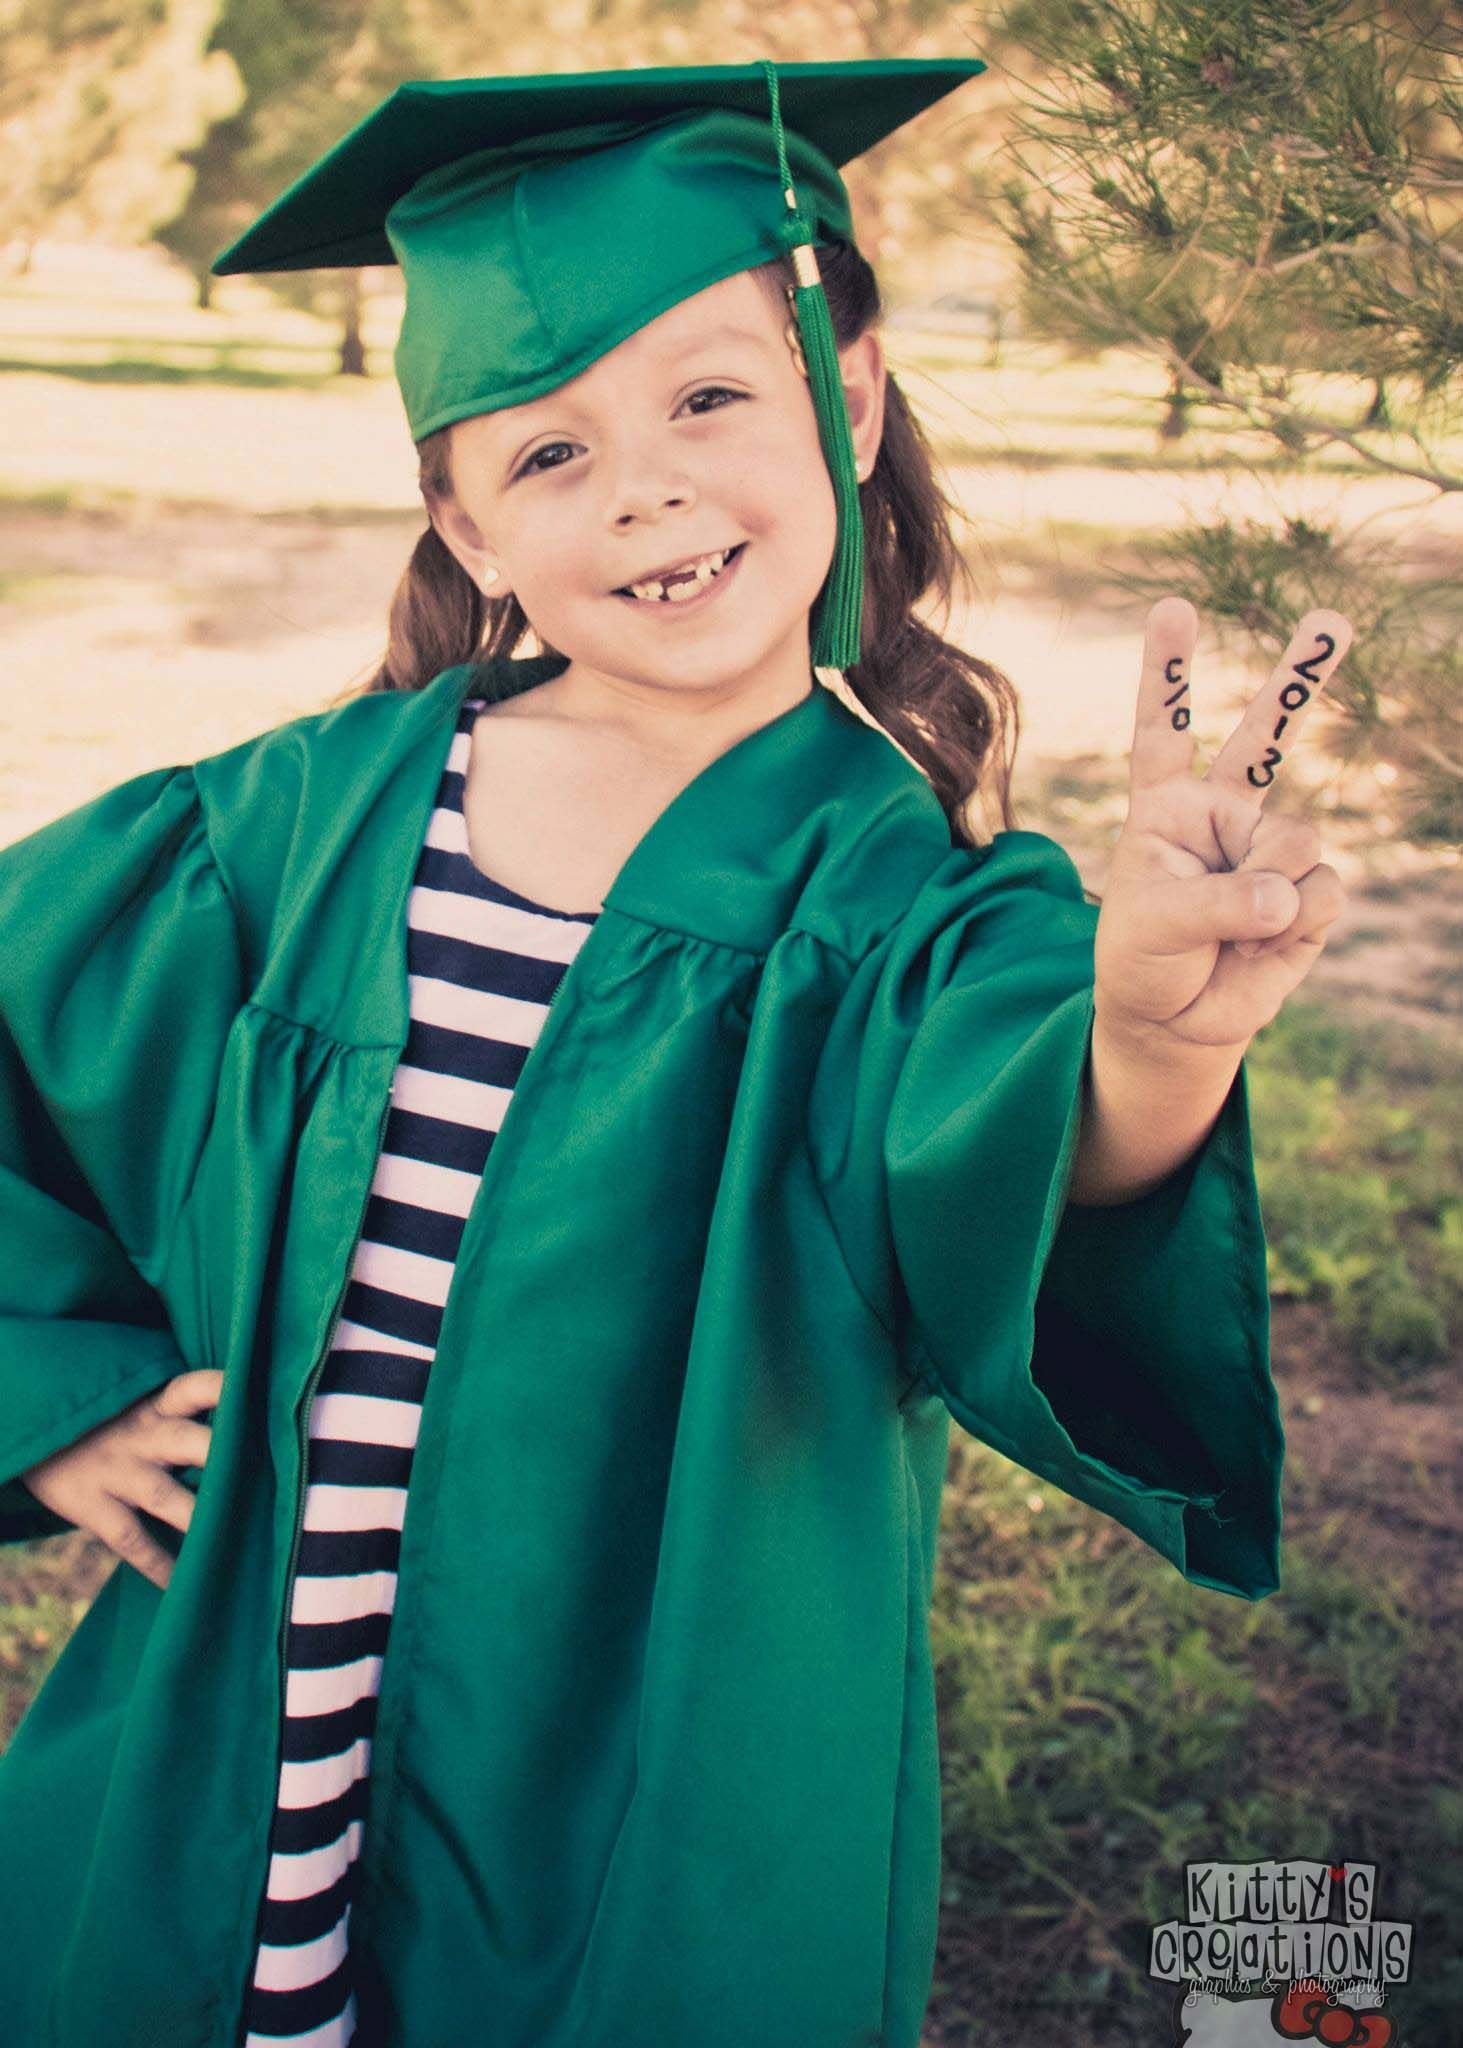 47++ Preschool cap and gown ideas info